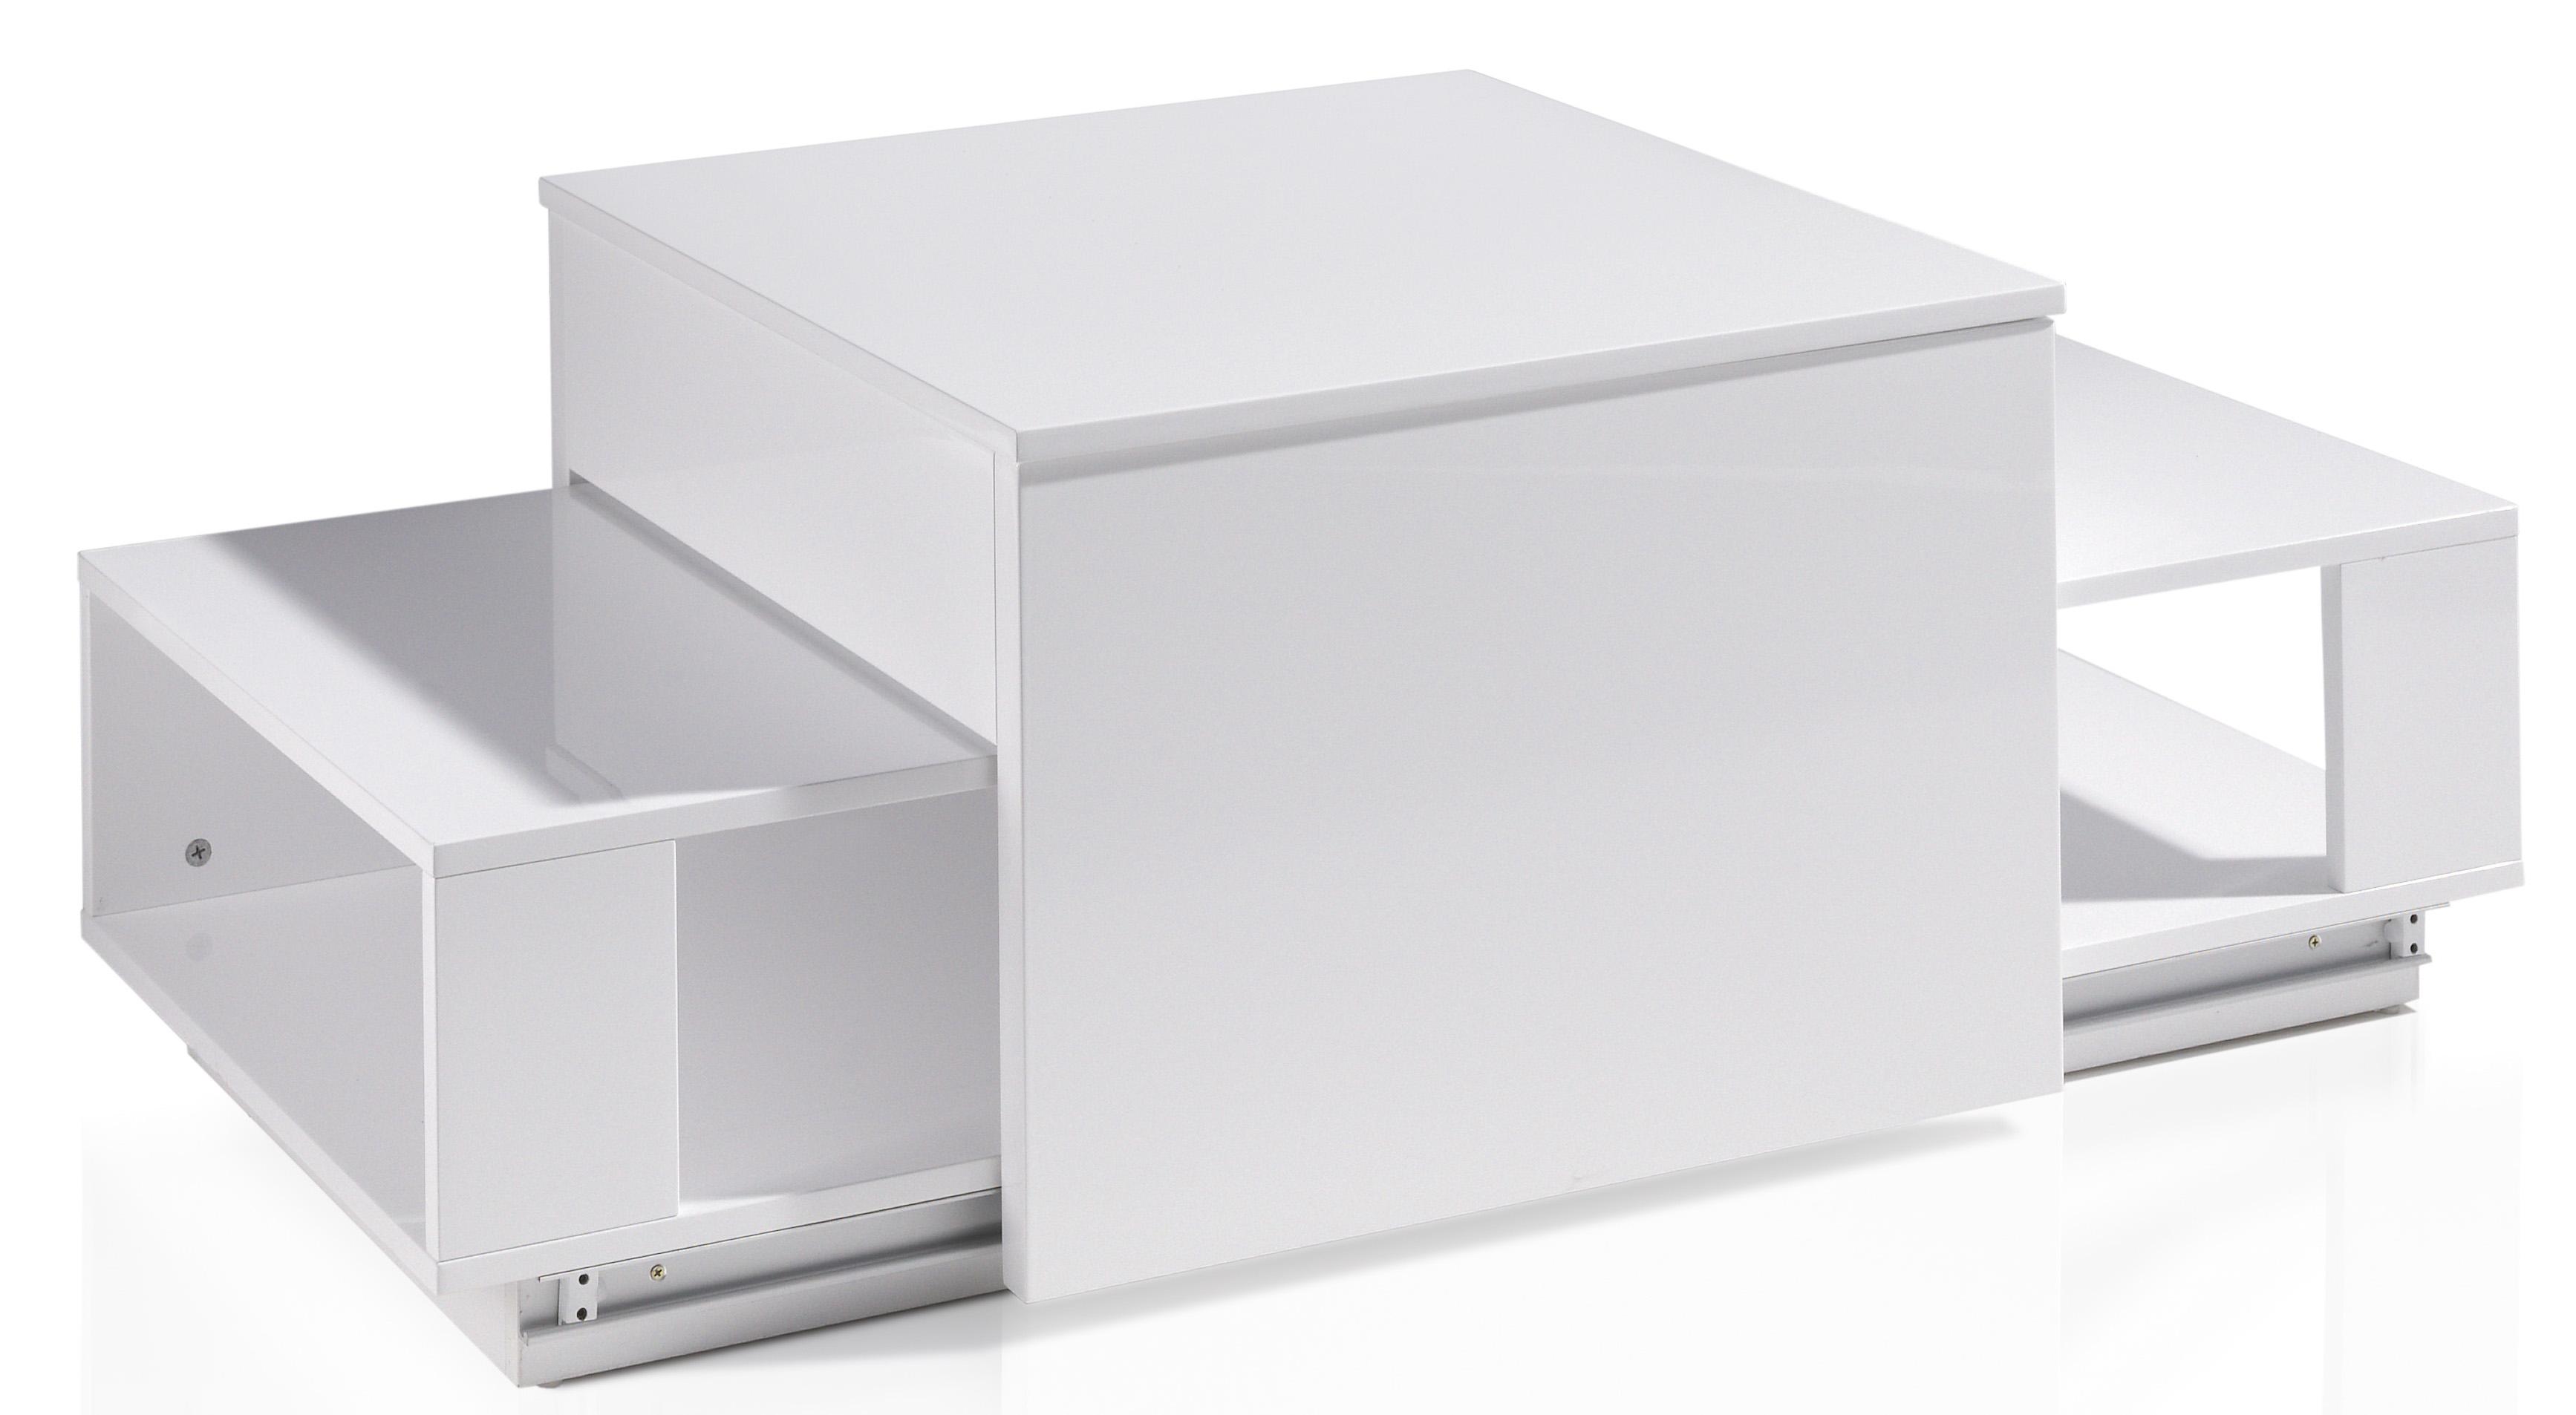 table basse relevable laqu e blanc optima. Black Bedroom Furniture Sets. Home Design Ideas